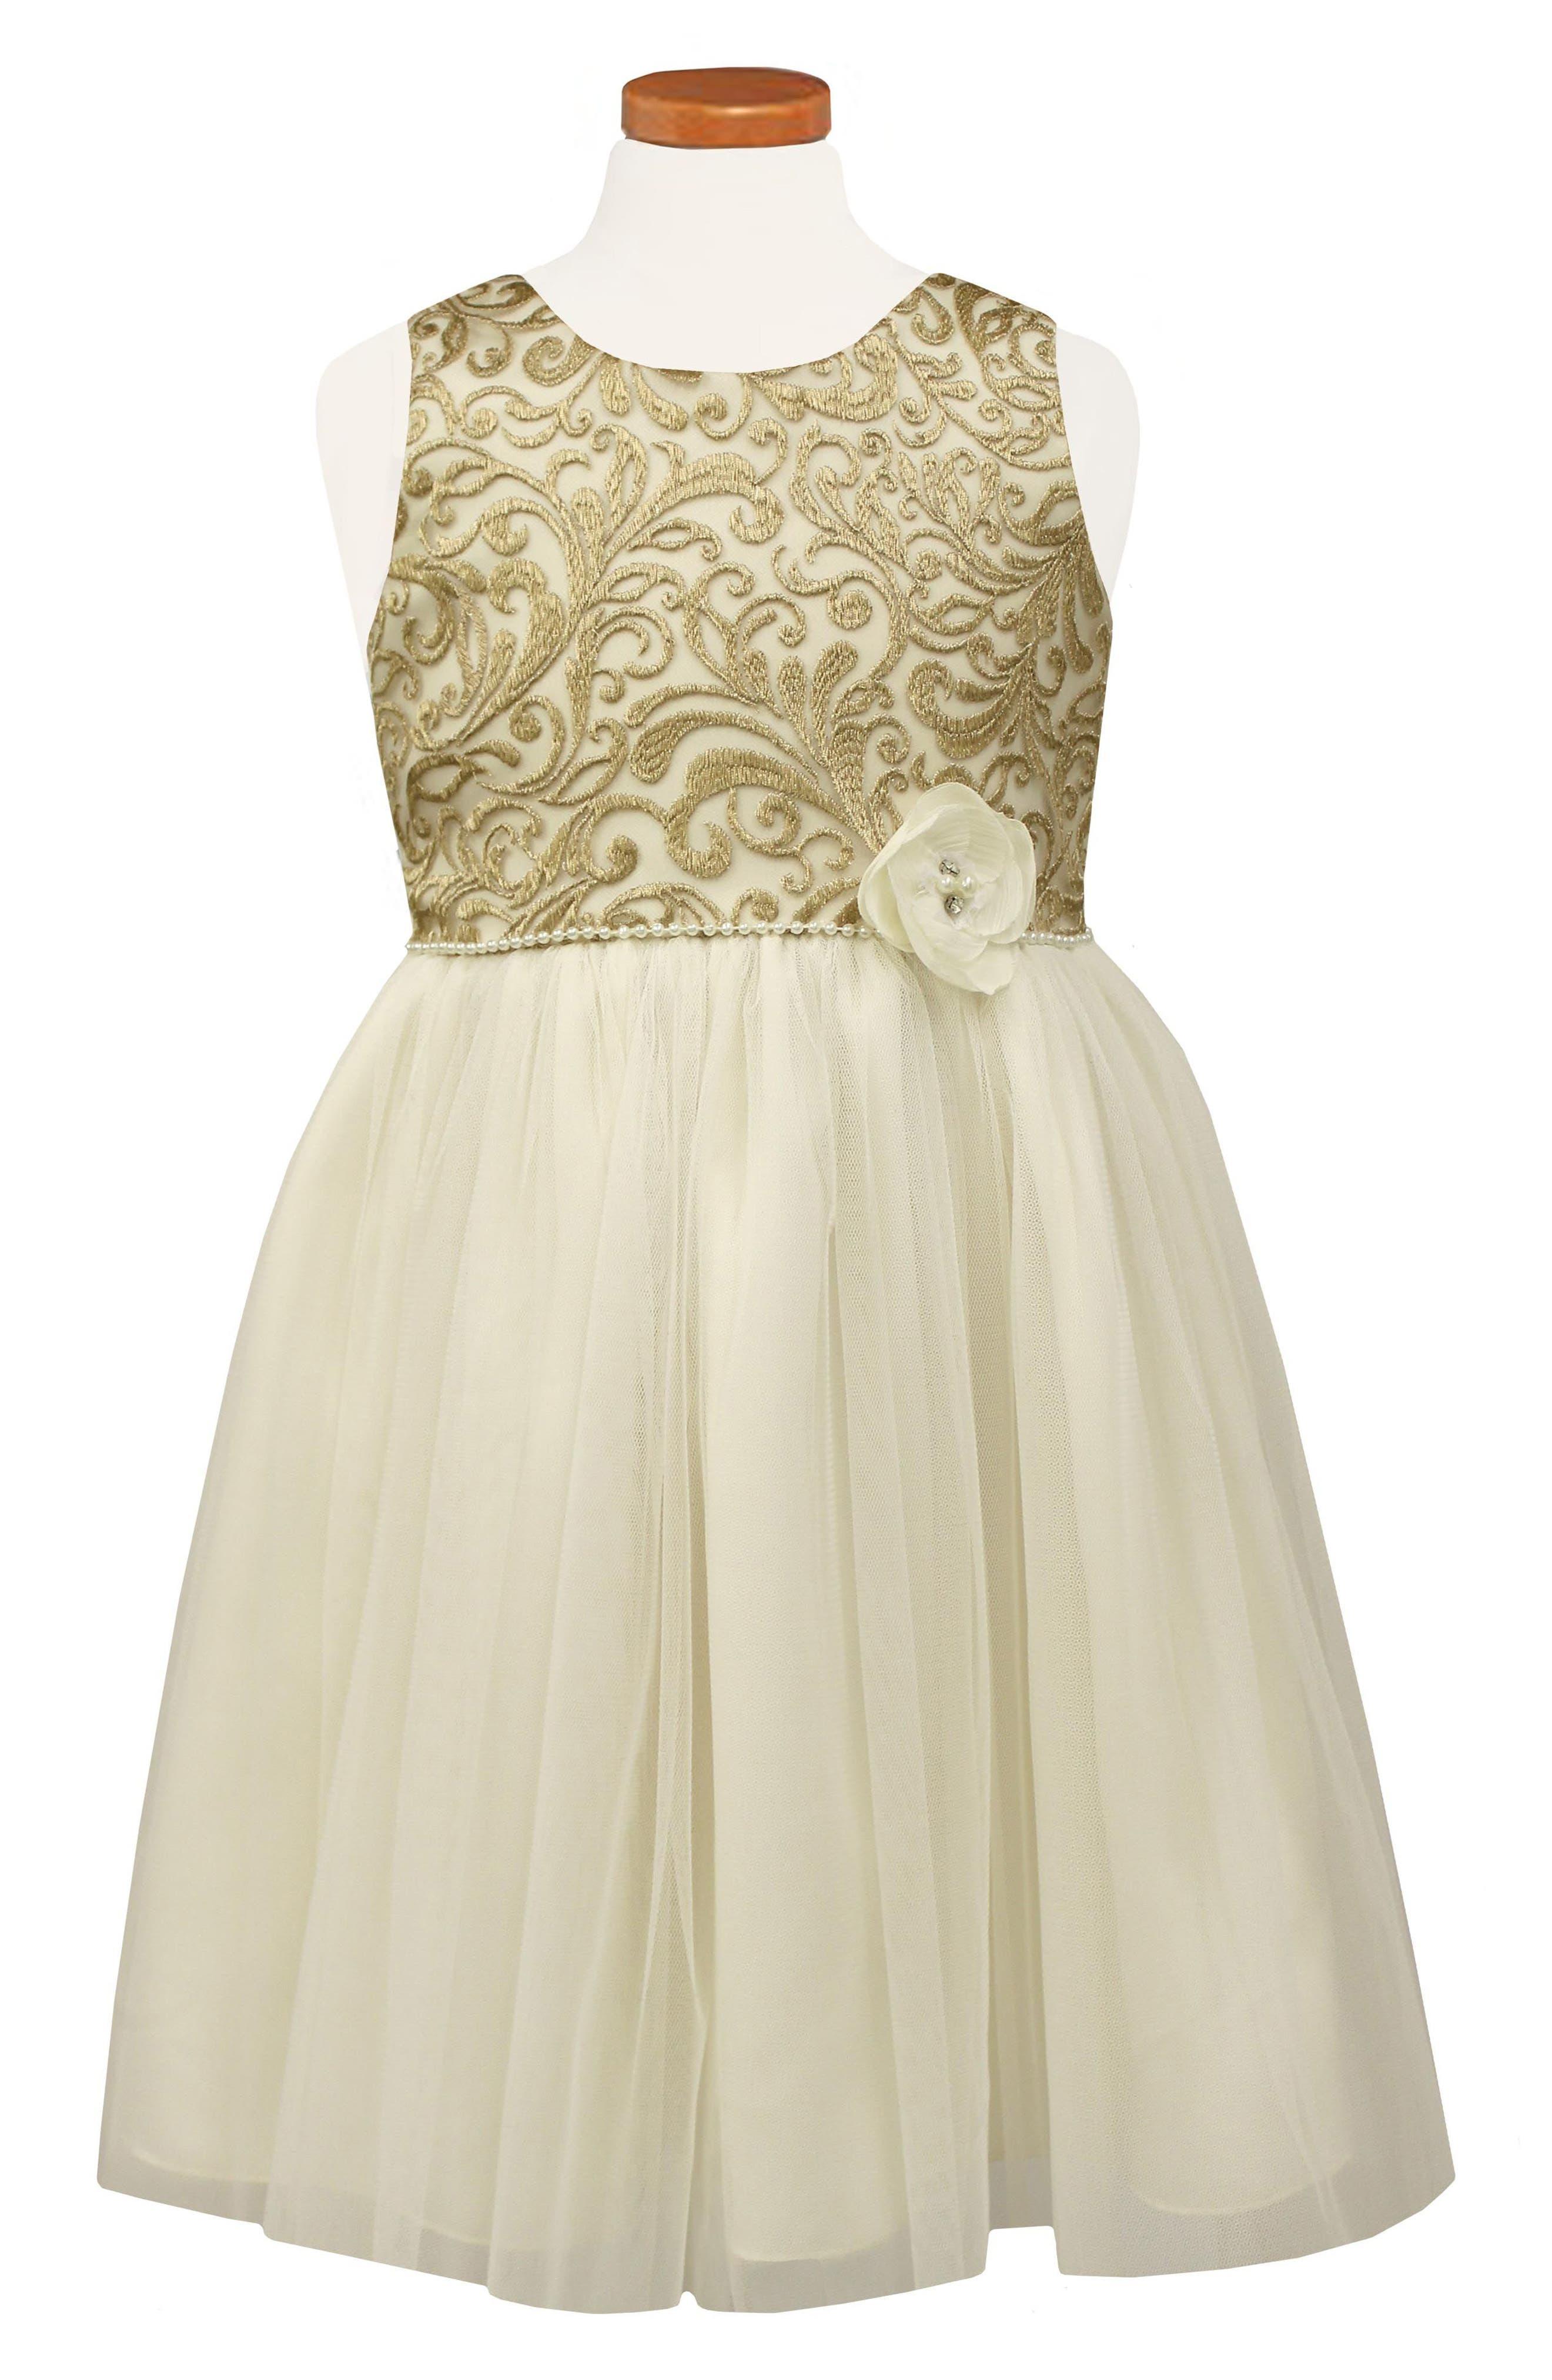 Brocade Ballerina Dress,                             Main thumbnail 1, color,                             Ivory